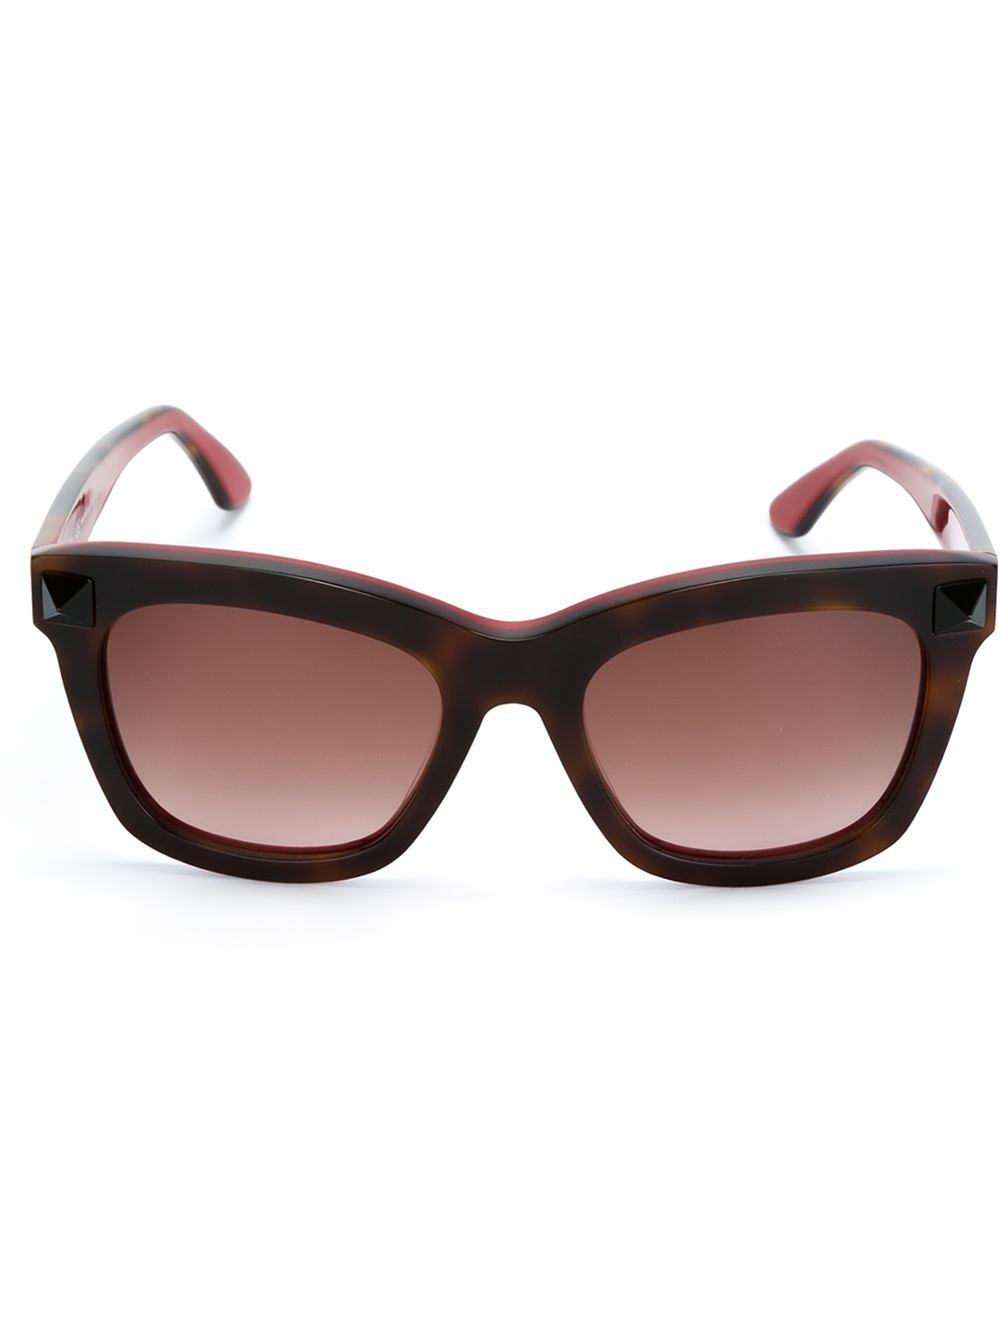 valentino garavani rockstud sunglasses in lyst